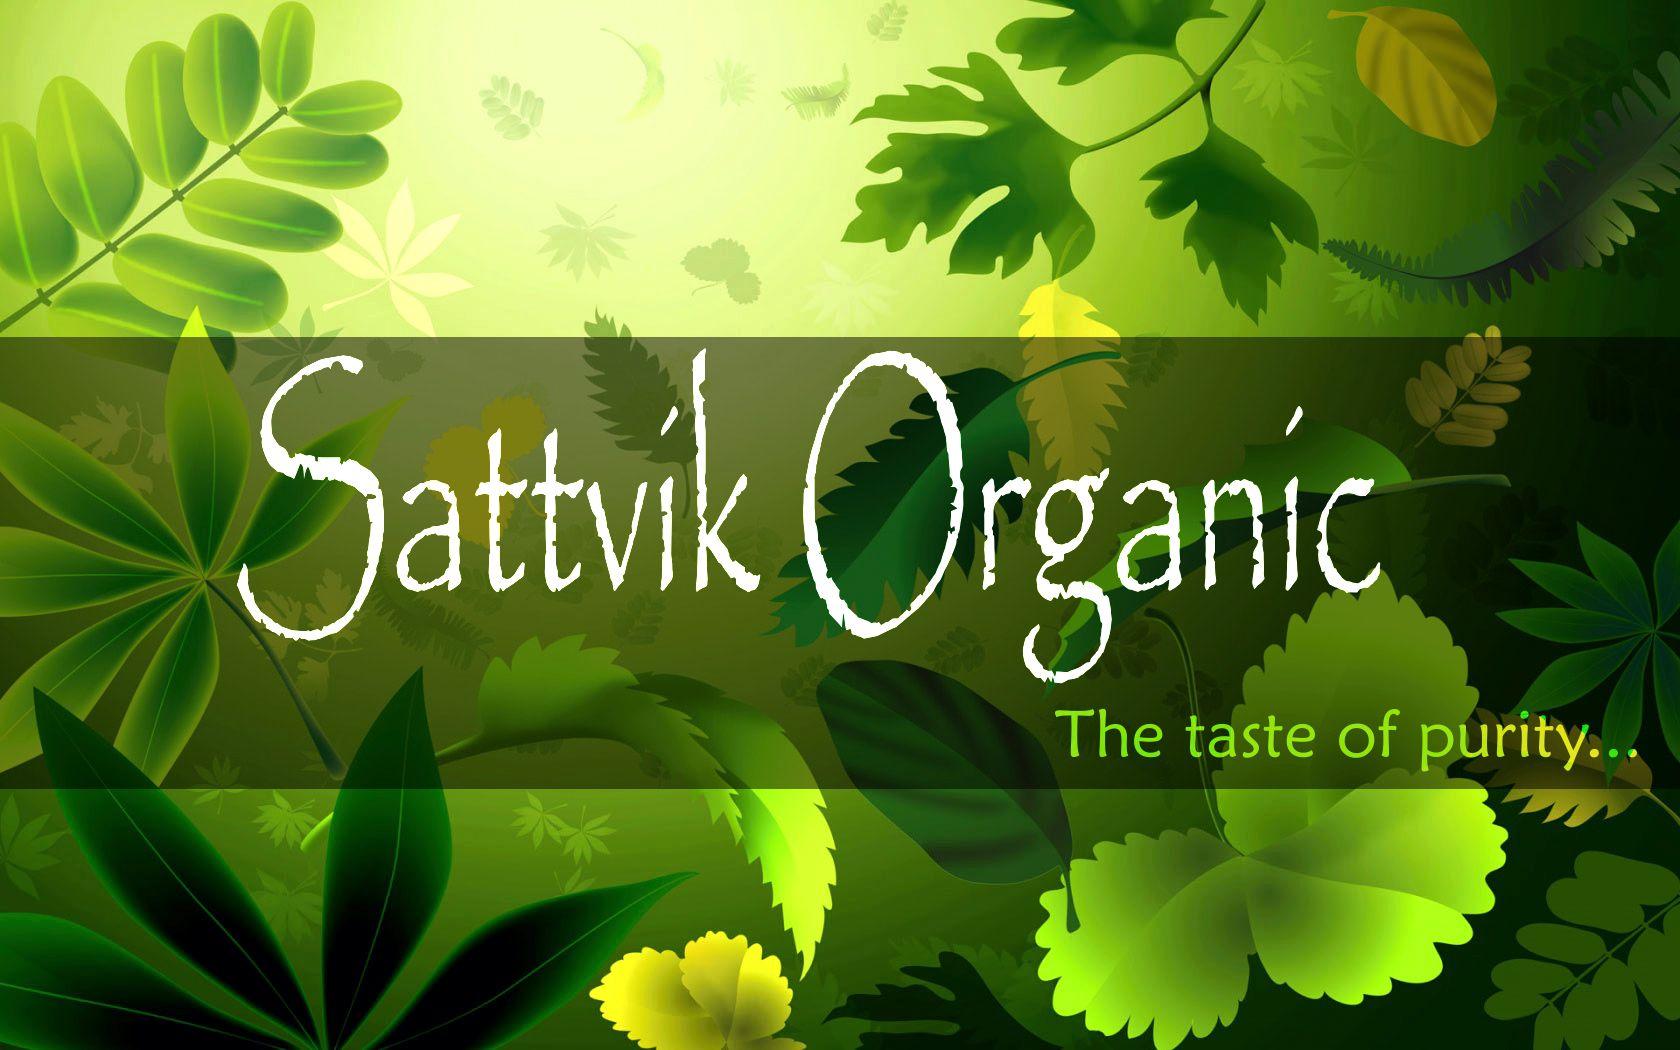 Sattvik Organic